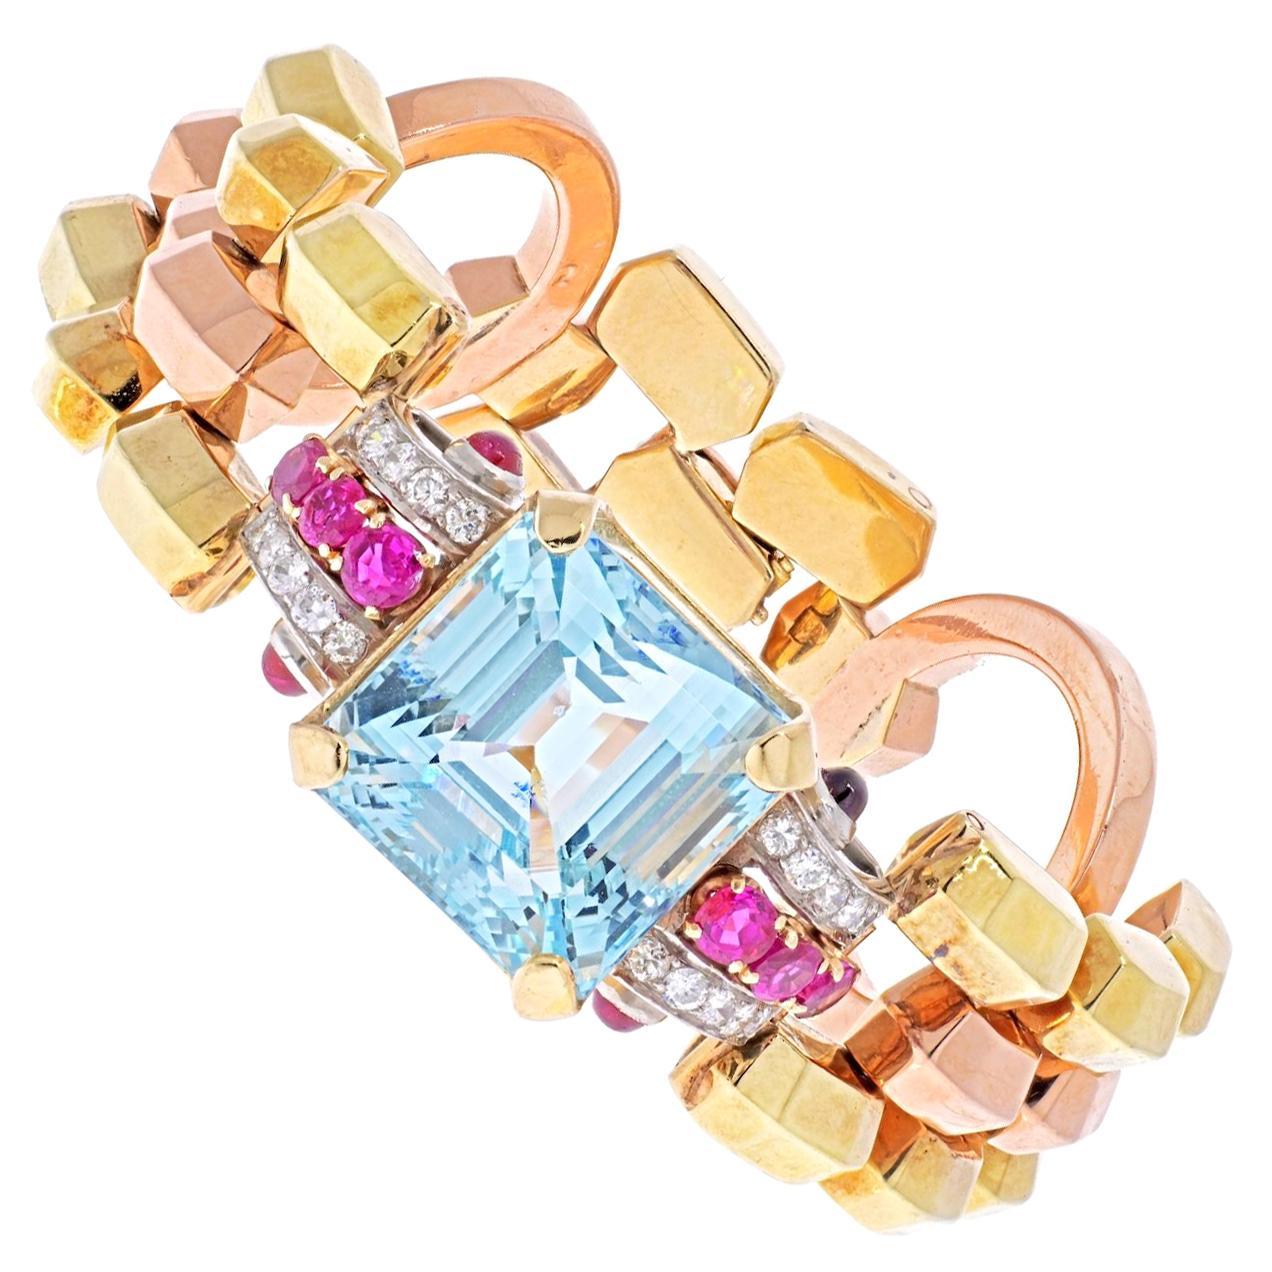 14K Rose Gold 1940's Retro Aquamarine, Diamond Link Bracelet